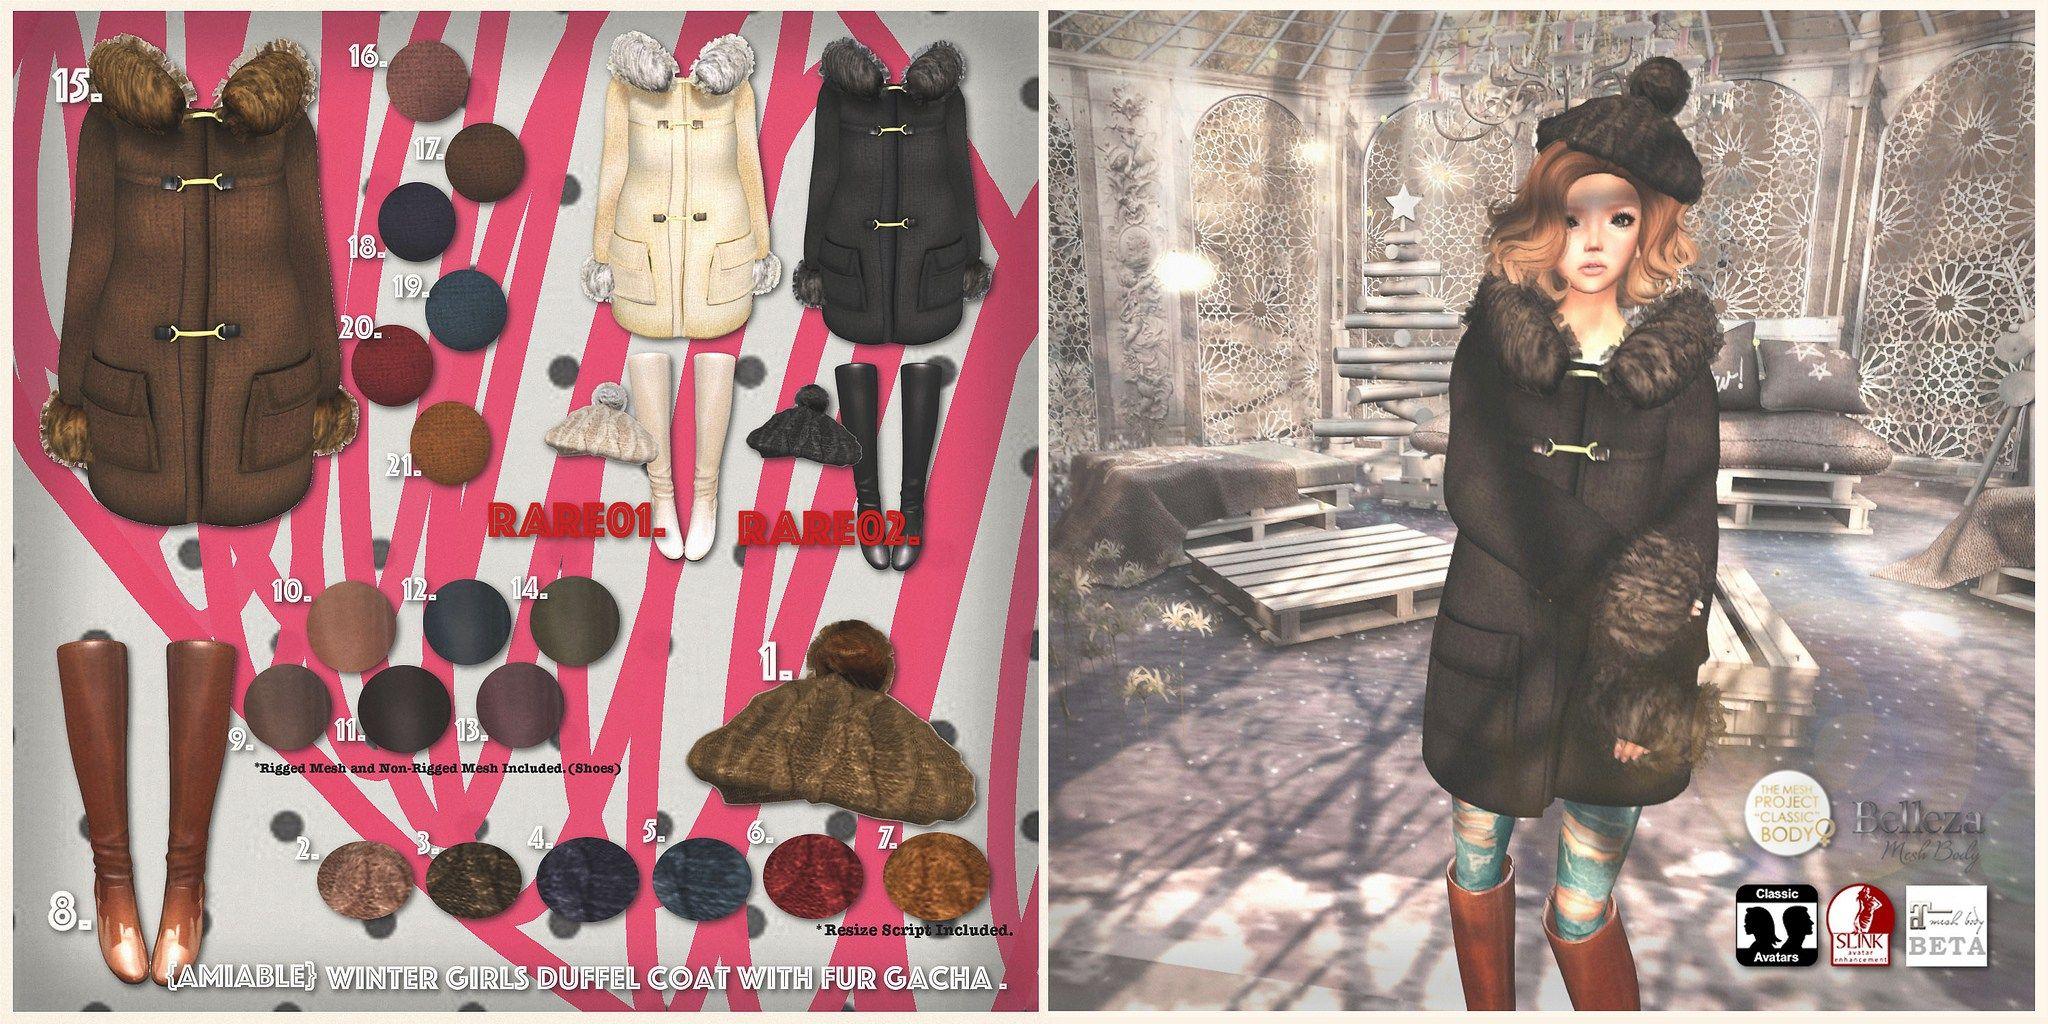 Amiable Winter Girls Duffel Coat with Fur Gacha   SL   Coat